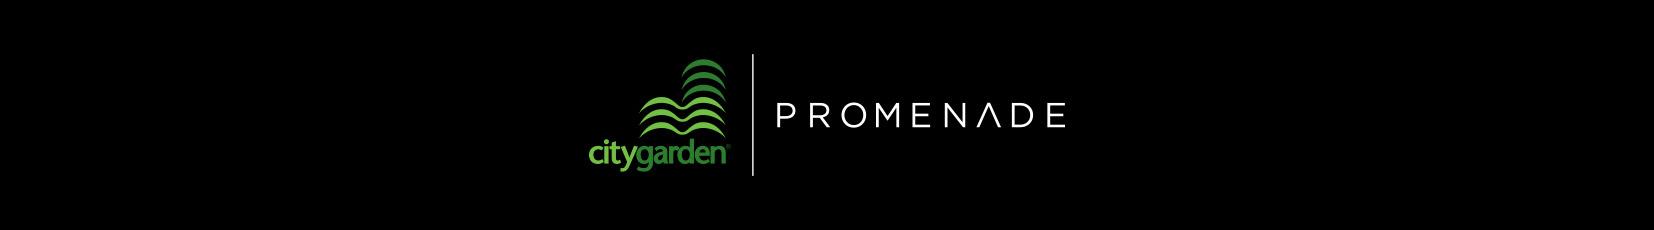 Property Branding and Communication